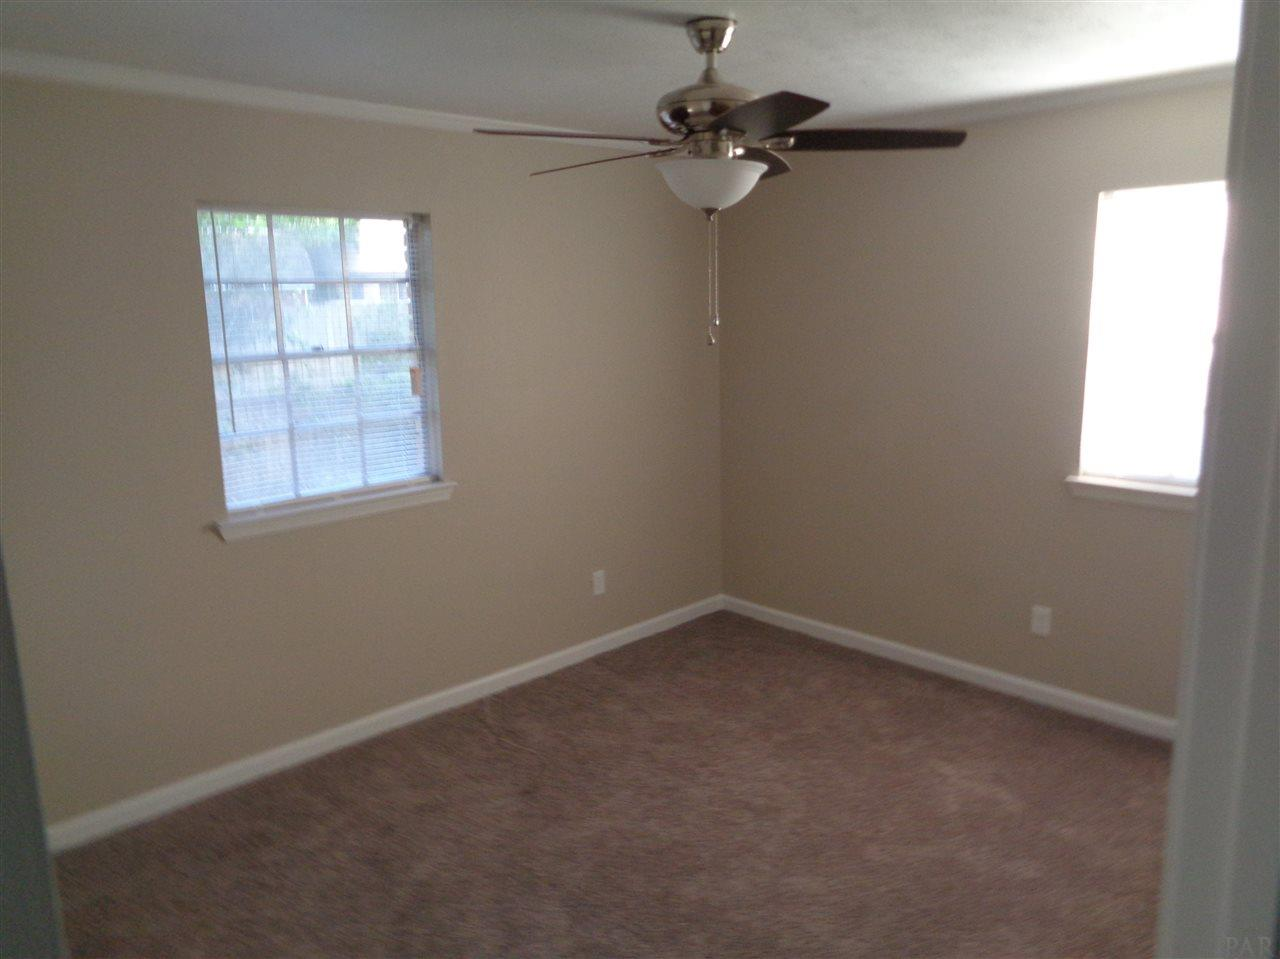 791 N 80th Ave, Pensacola, FL 32526